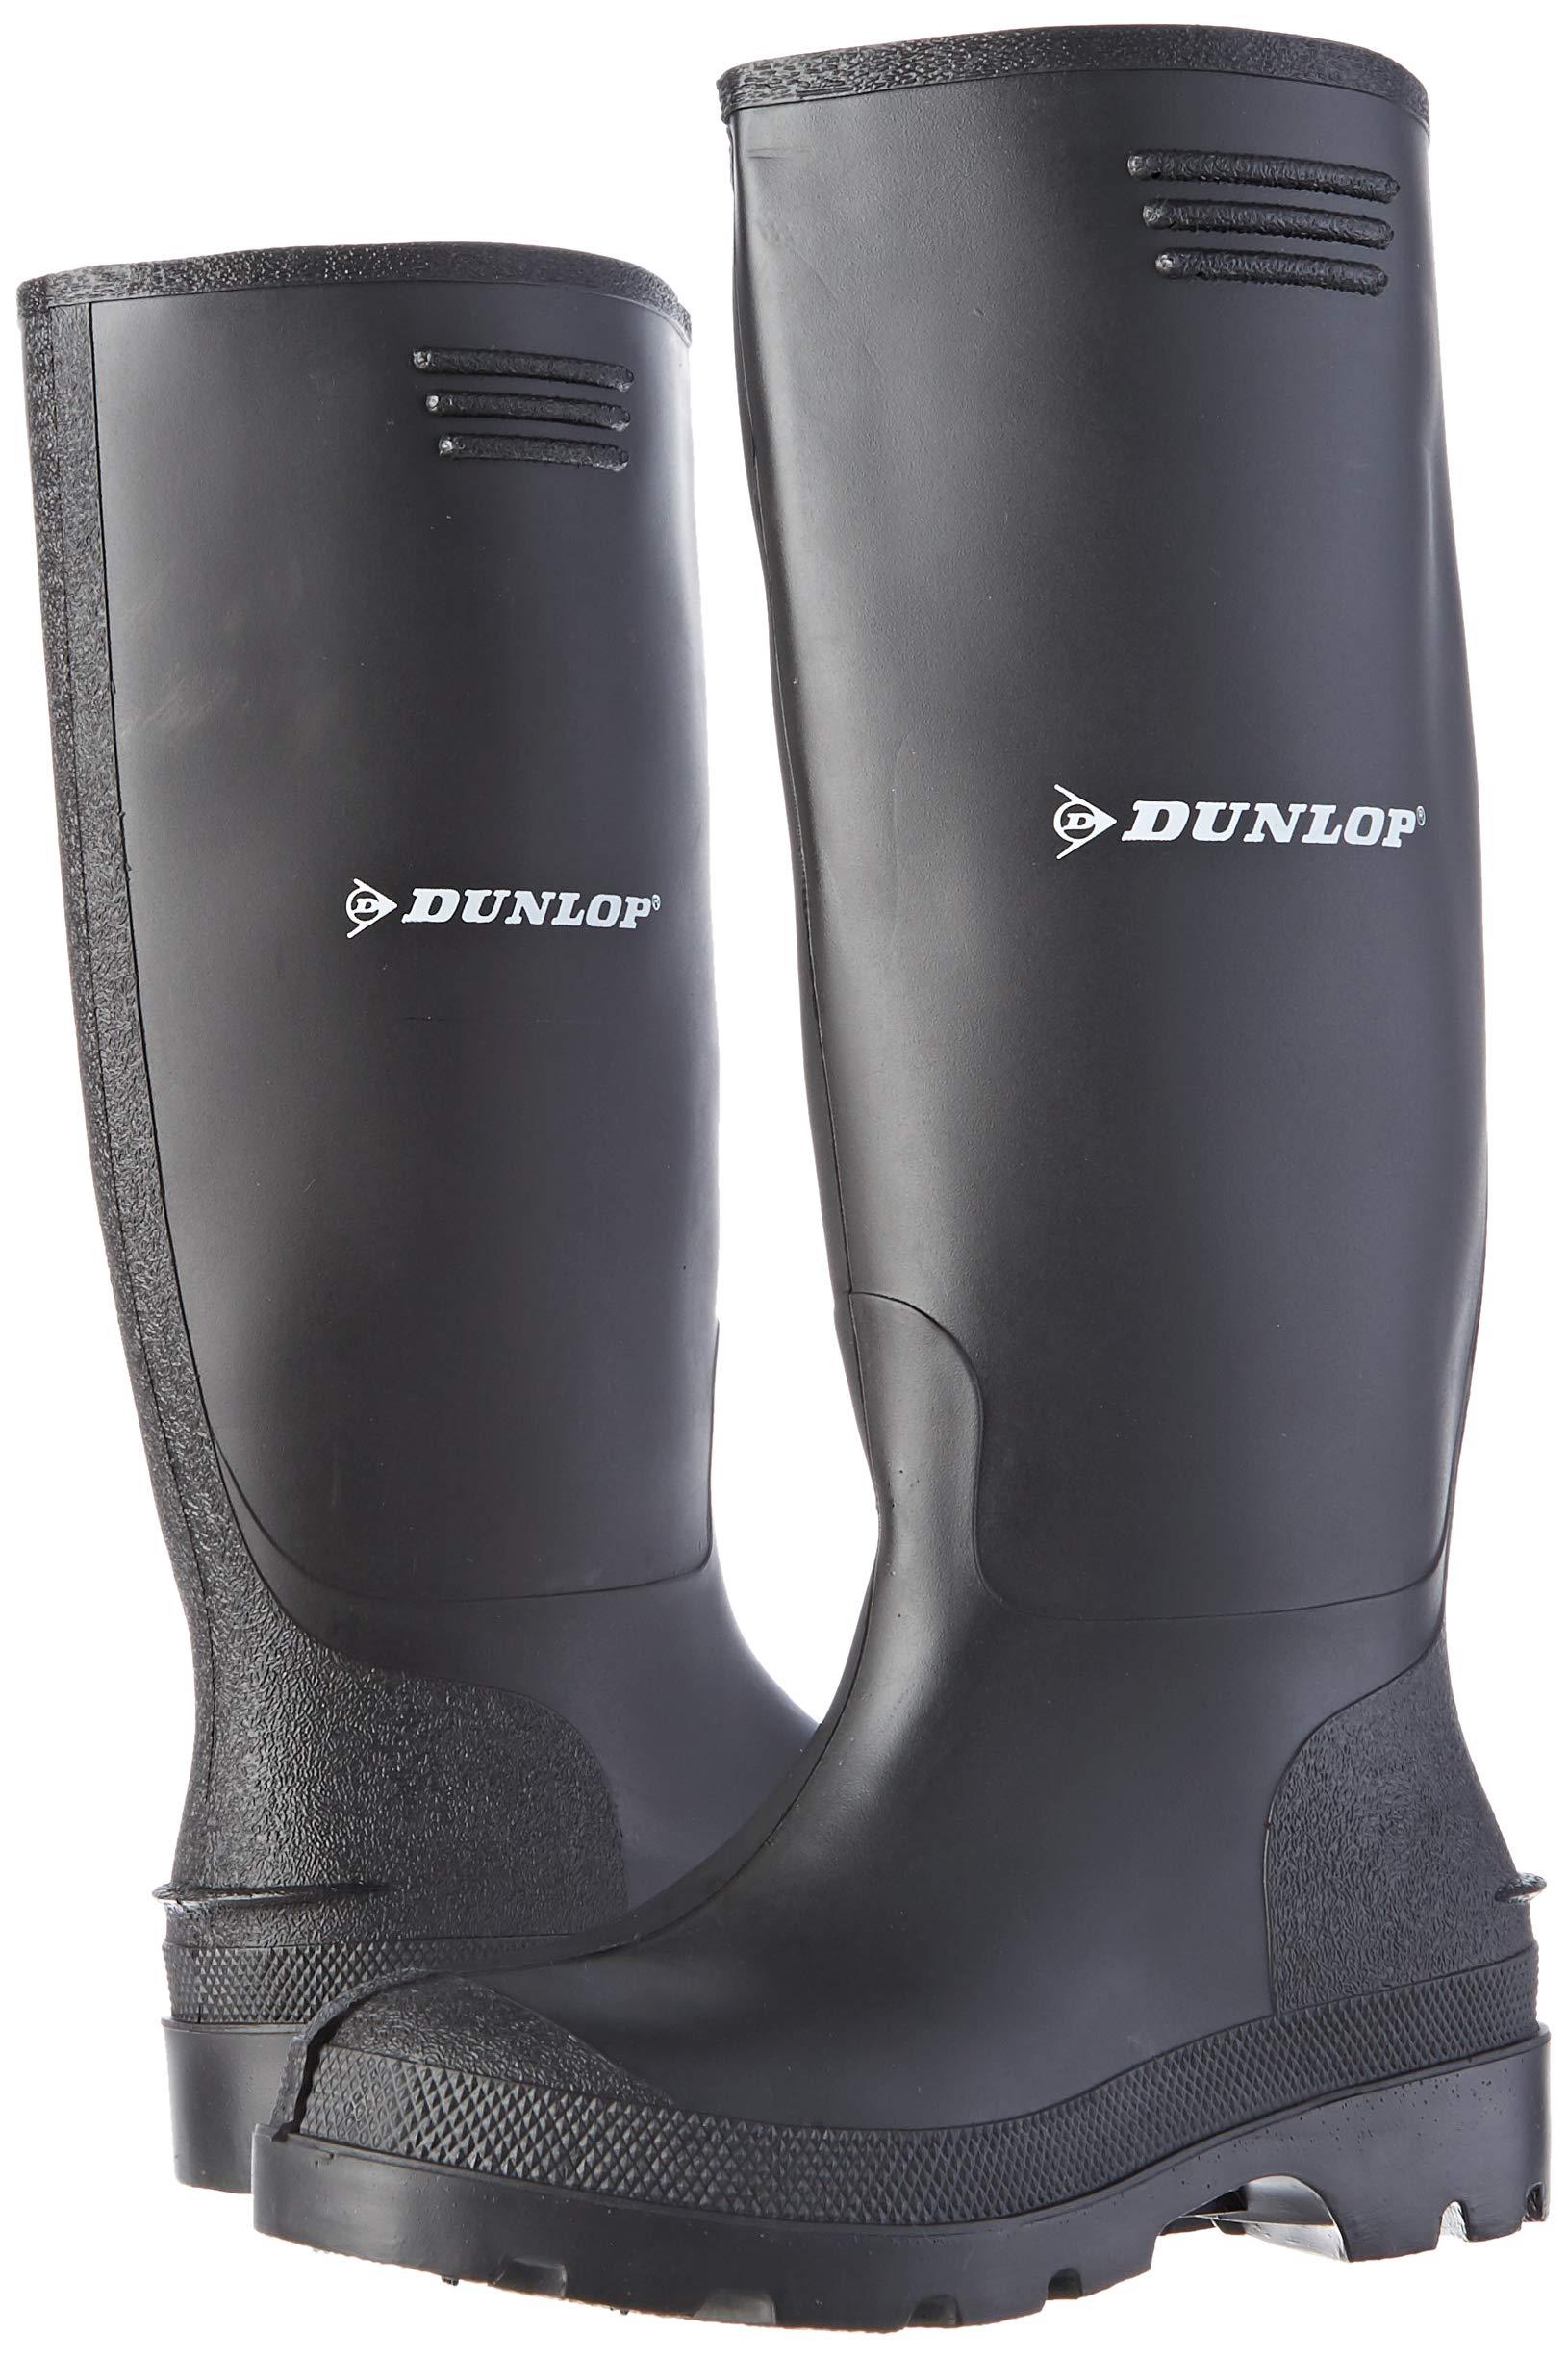 Dunlop Pricemastor PVC Welly / Mens Boots (8 UK) (Black) 5